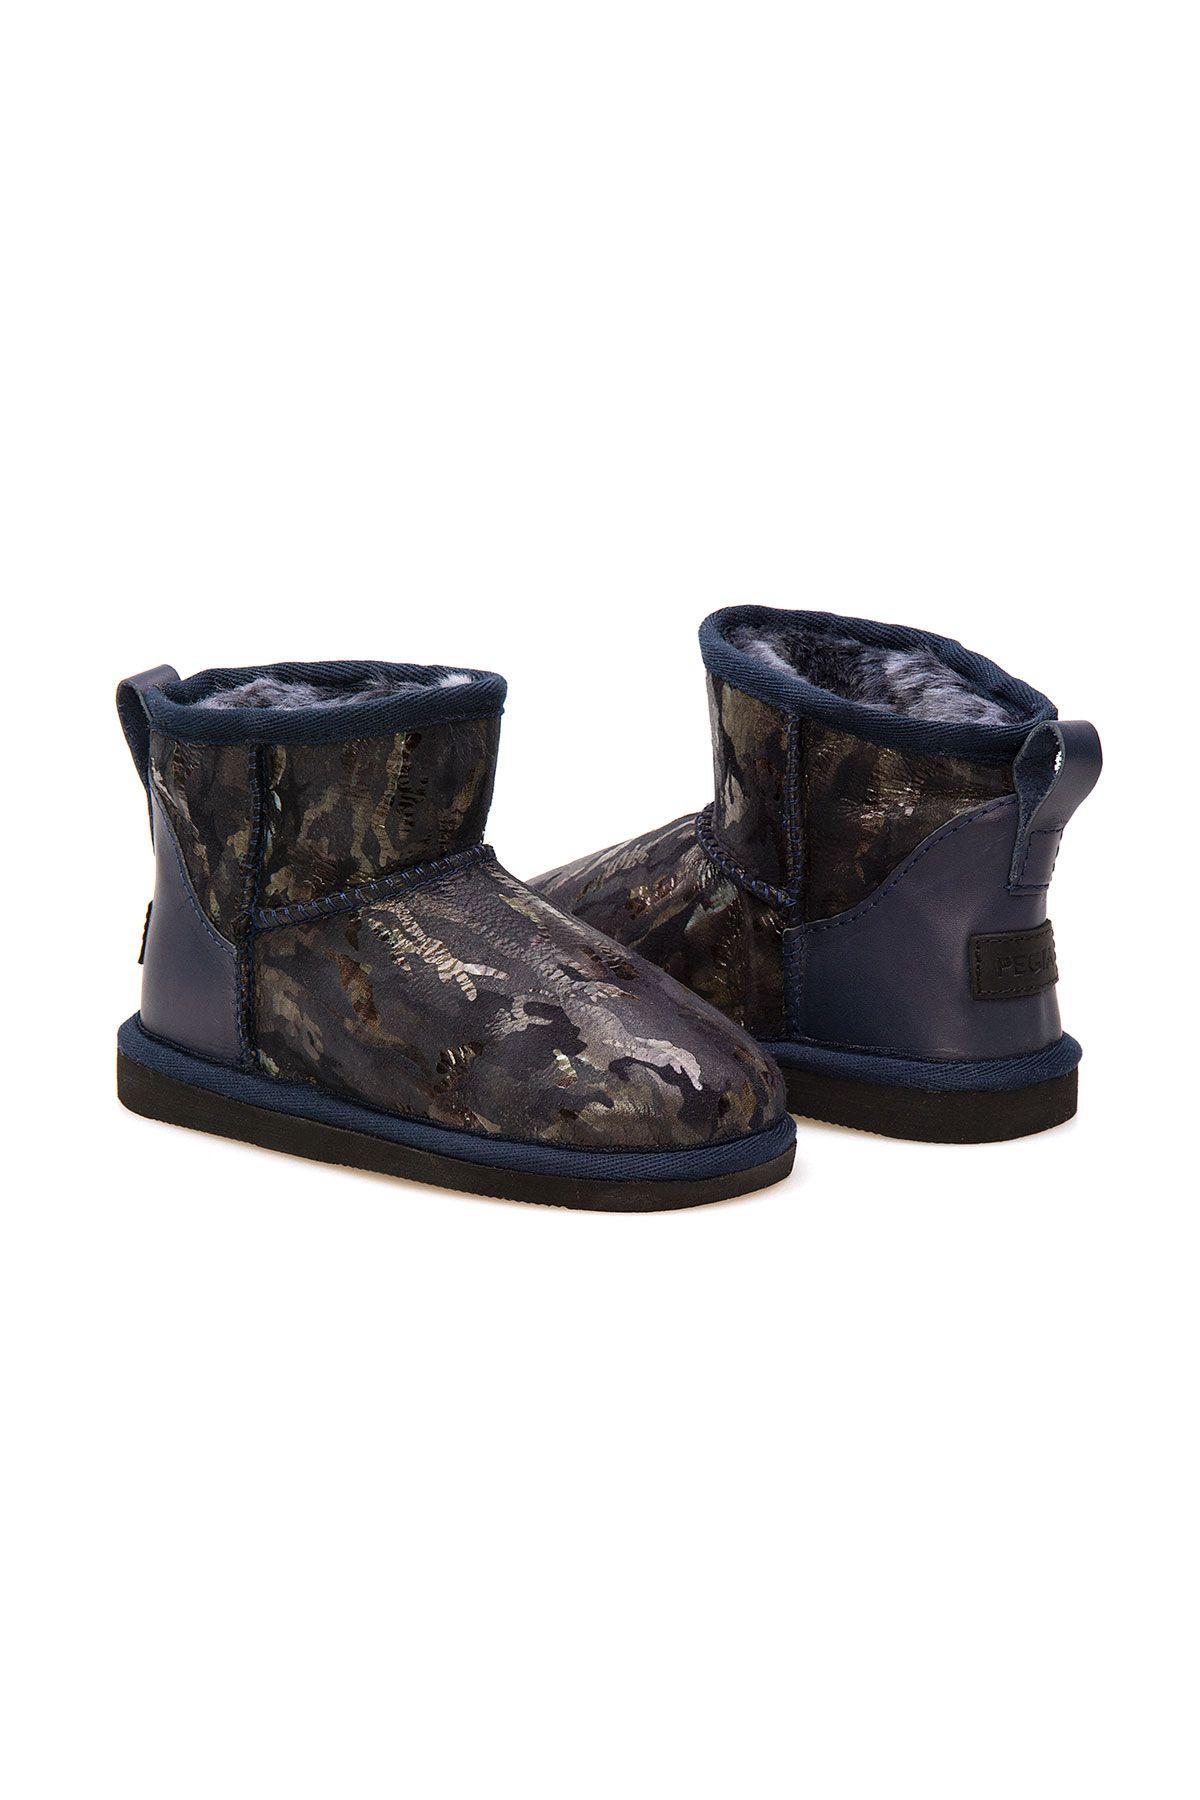 Pegia Sheepskin Kids Boots 186055 Navy blue